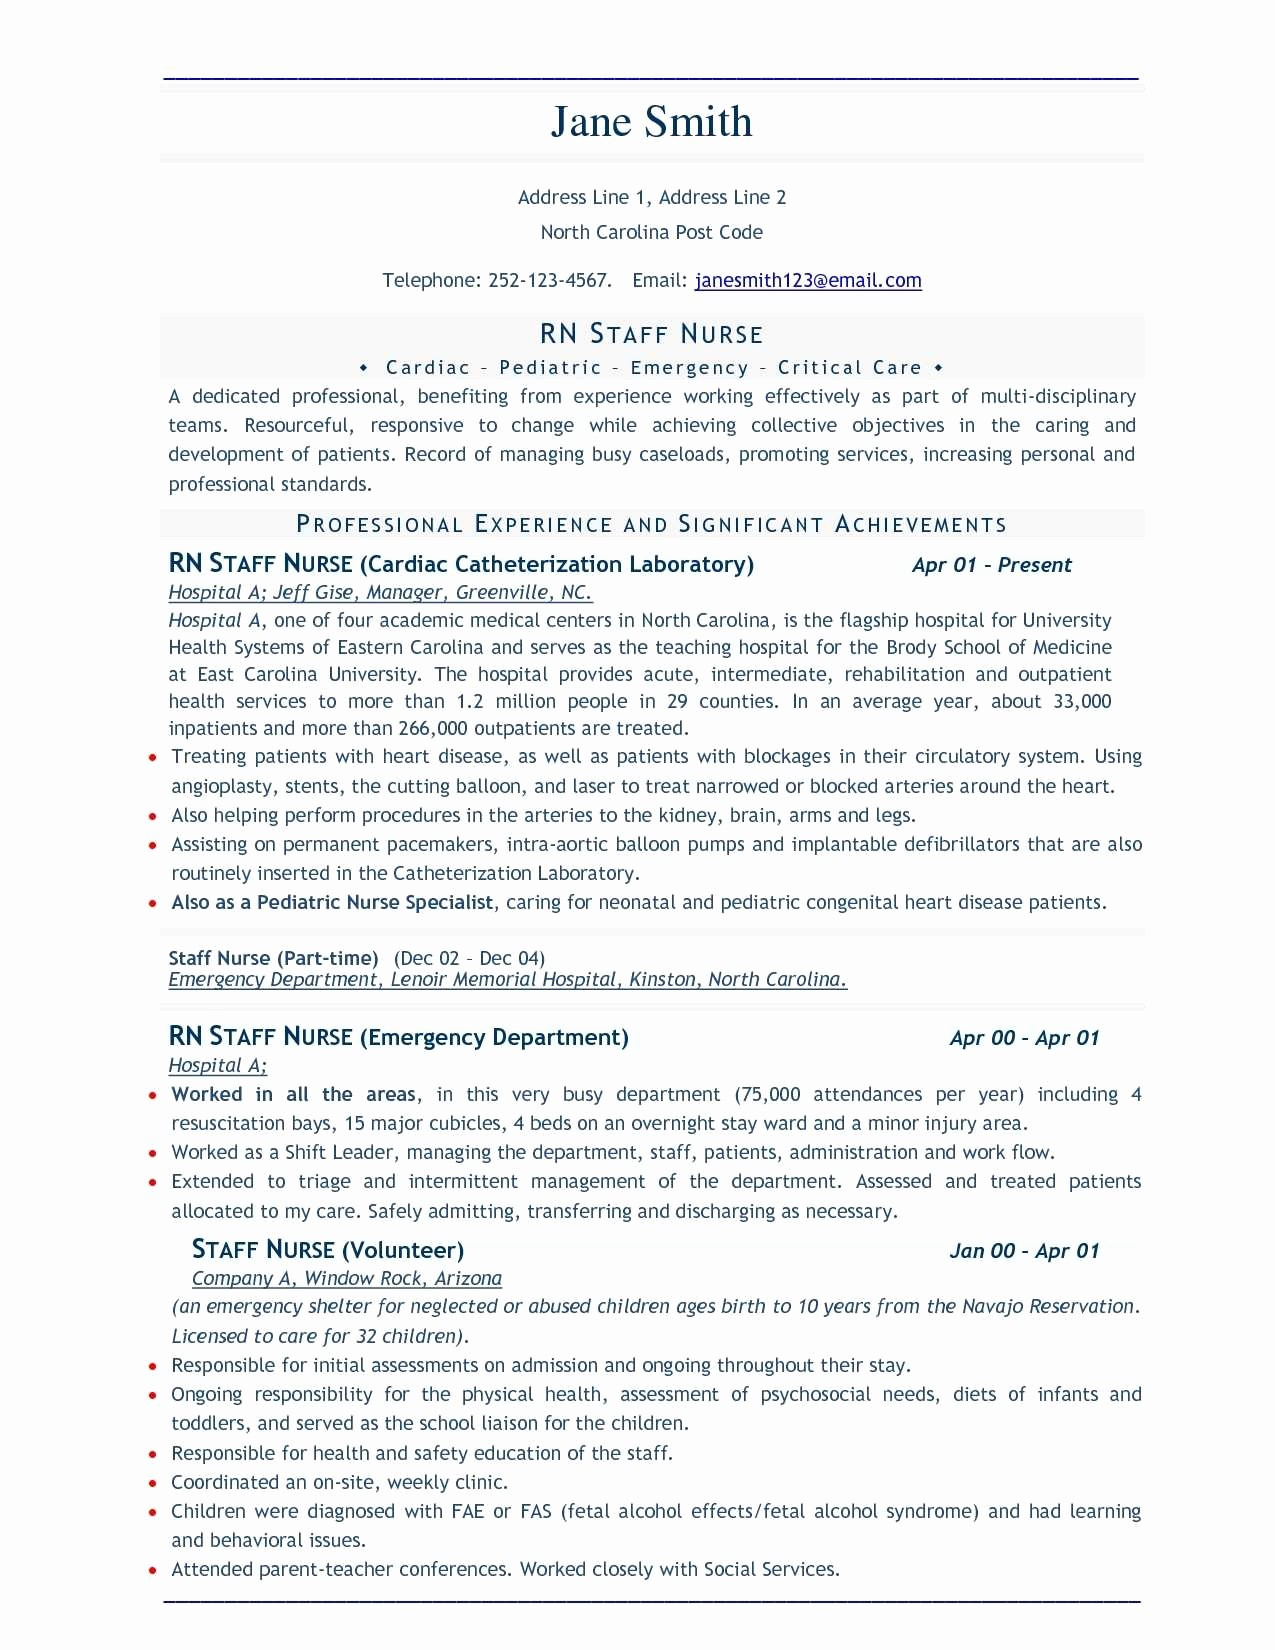 Creative Resume Template Microsoft Word Beautiful 41 Last Creative Resume Templates Free Download for